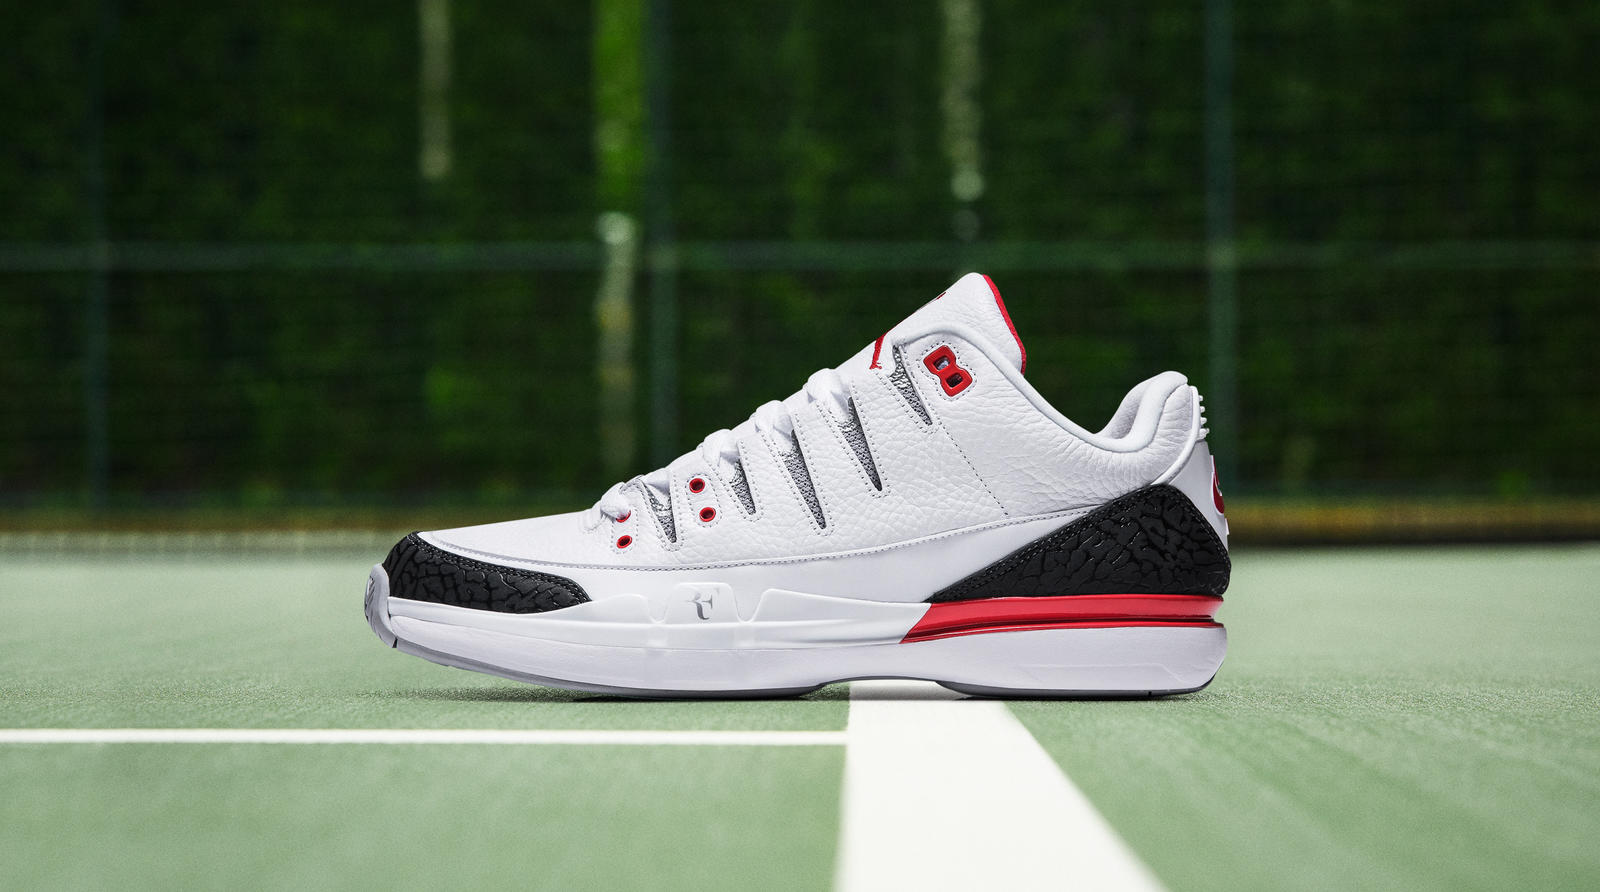 8cf9ad7e07d Nike-Zoom-Vapor-RF-Air-Jordan-3-Fire-Red - WearTesters